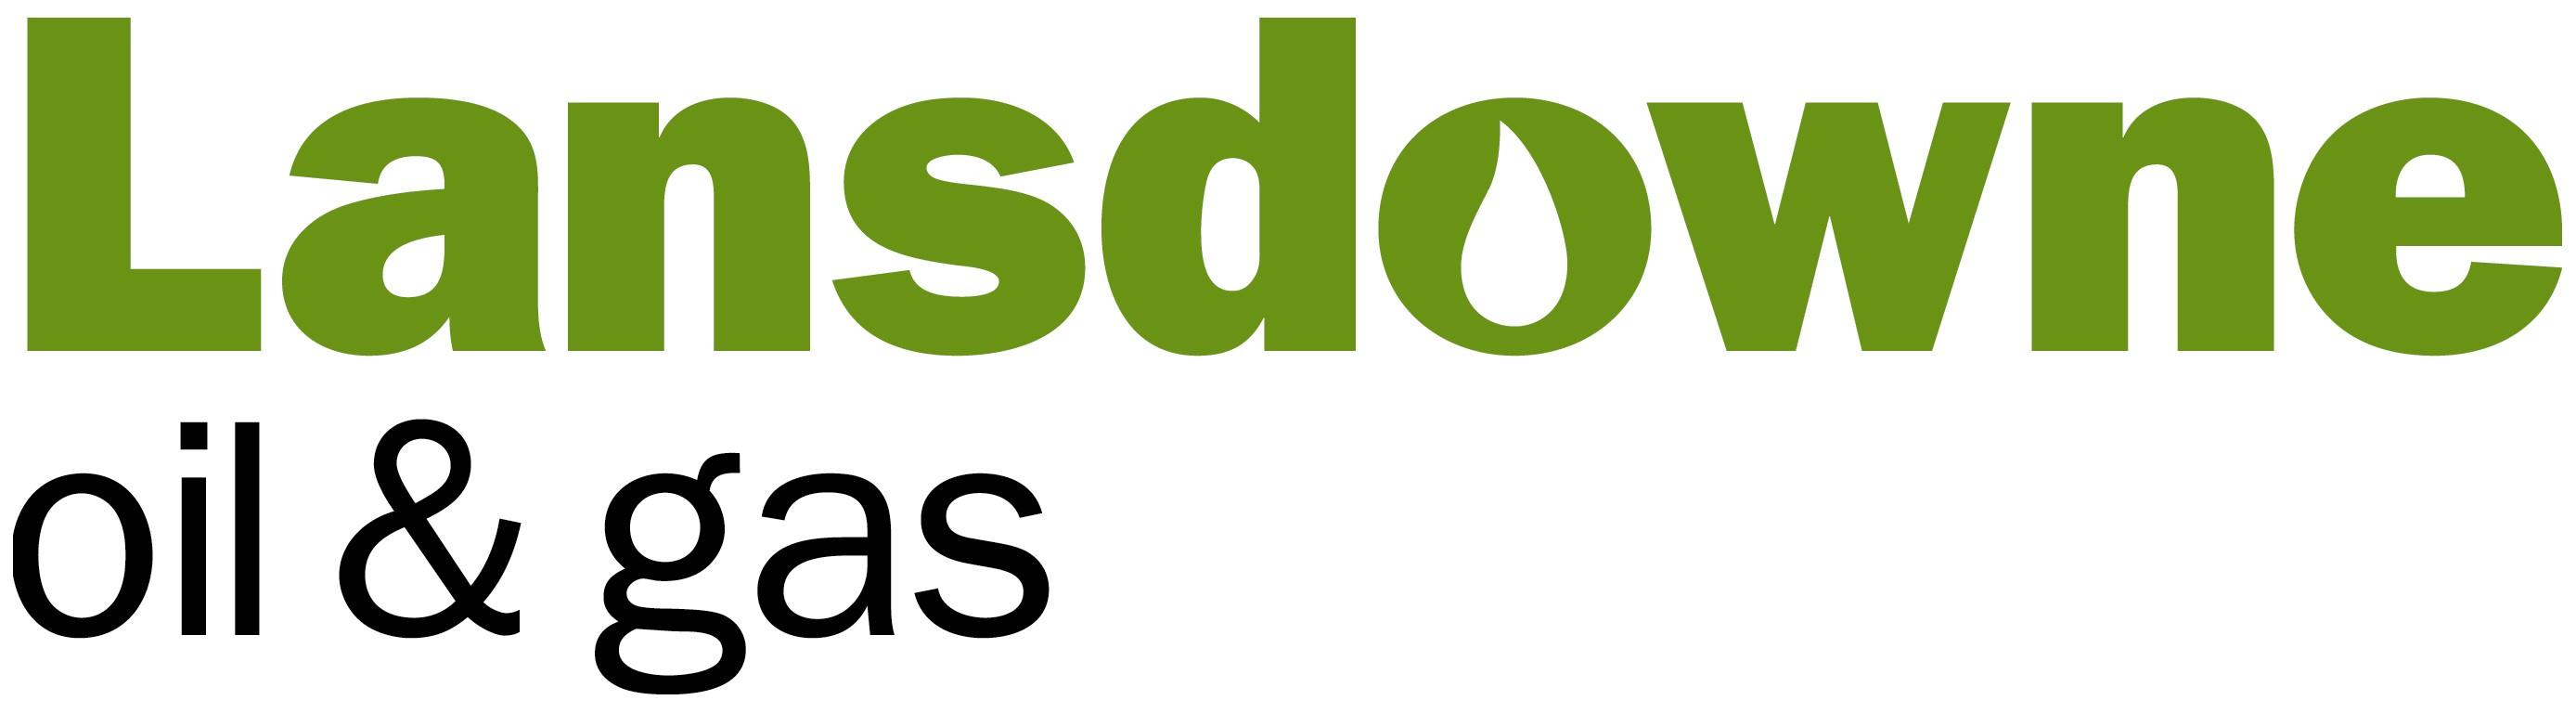 Lansdowne Oil & Gas logo